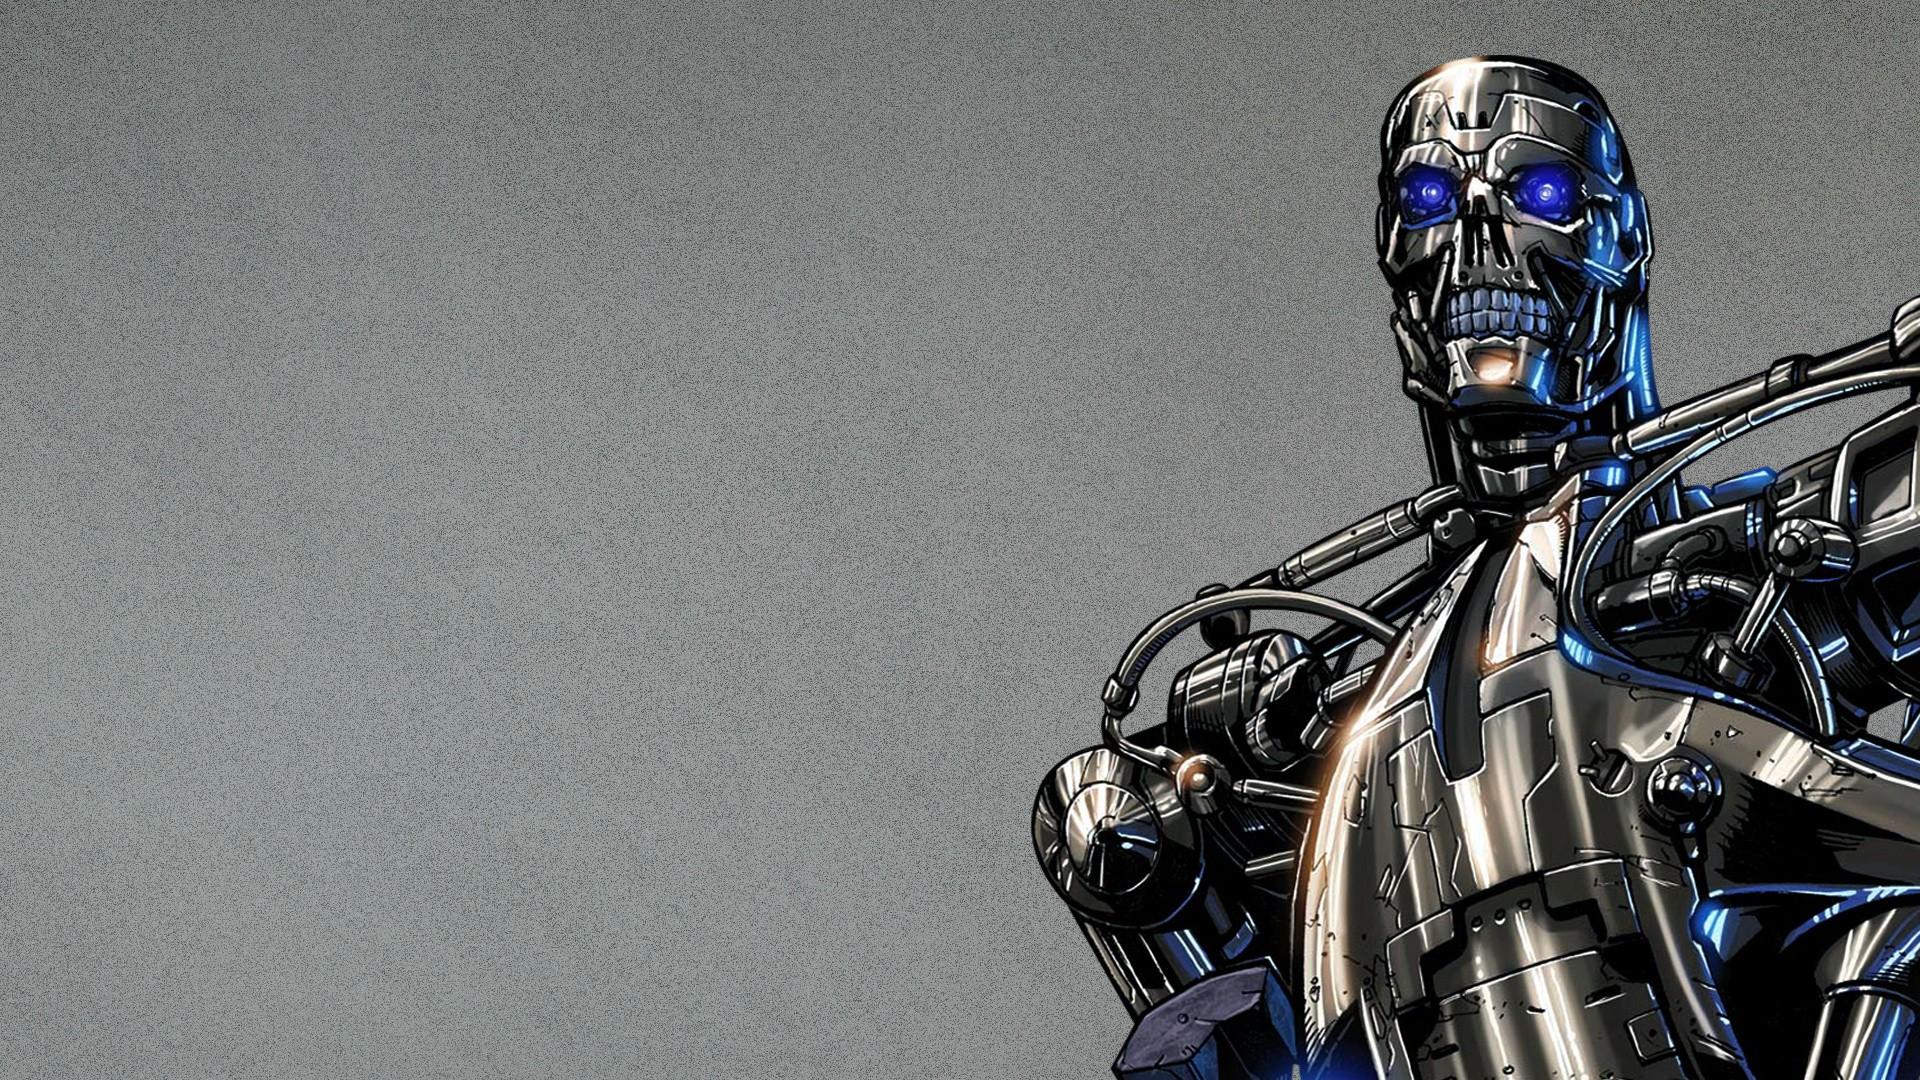 HD Terminator Backgrounds 1920x1080